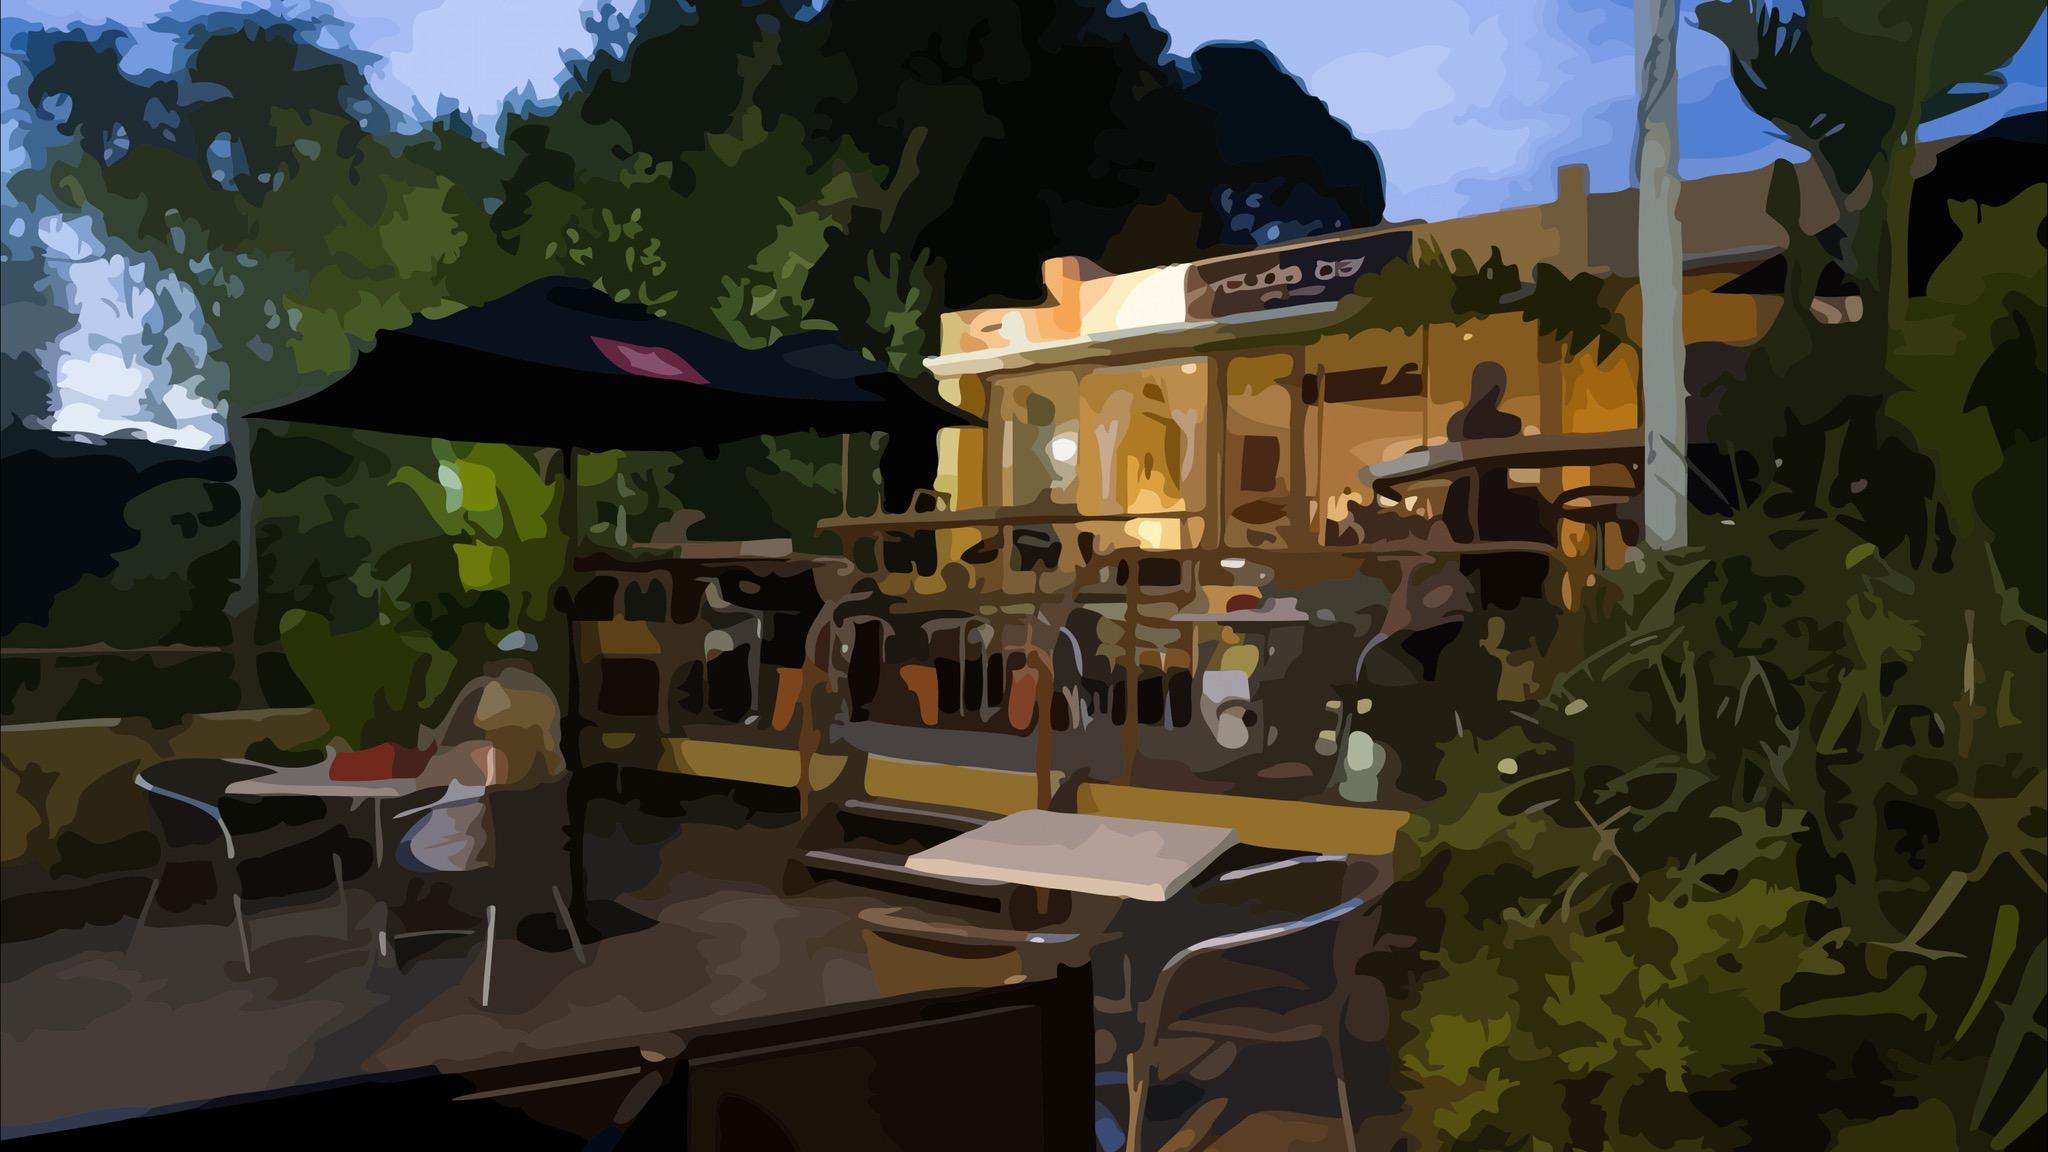 Cuda Bar And Restauarnt